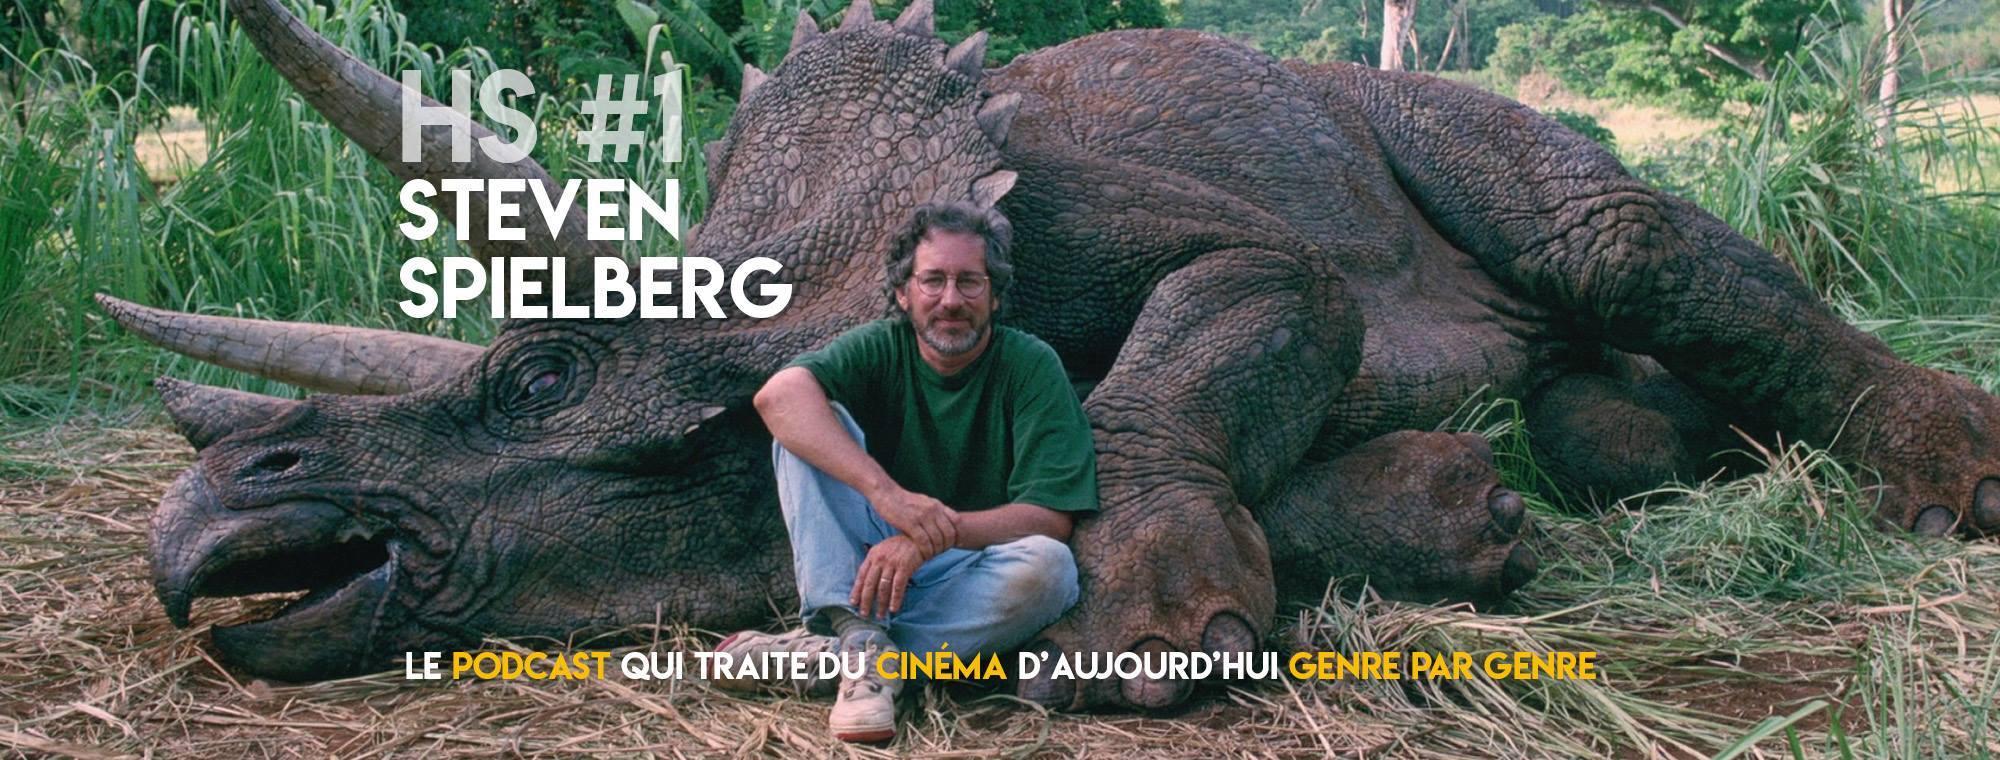 Parlons Péloches - HS #1 Steven Spielberg